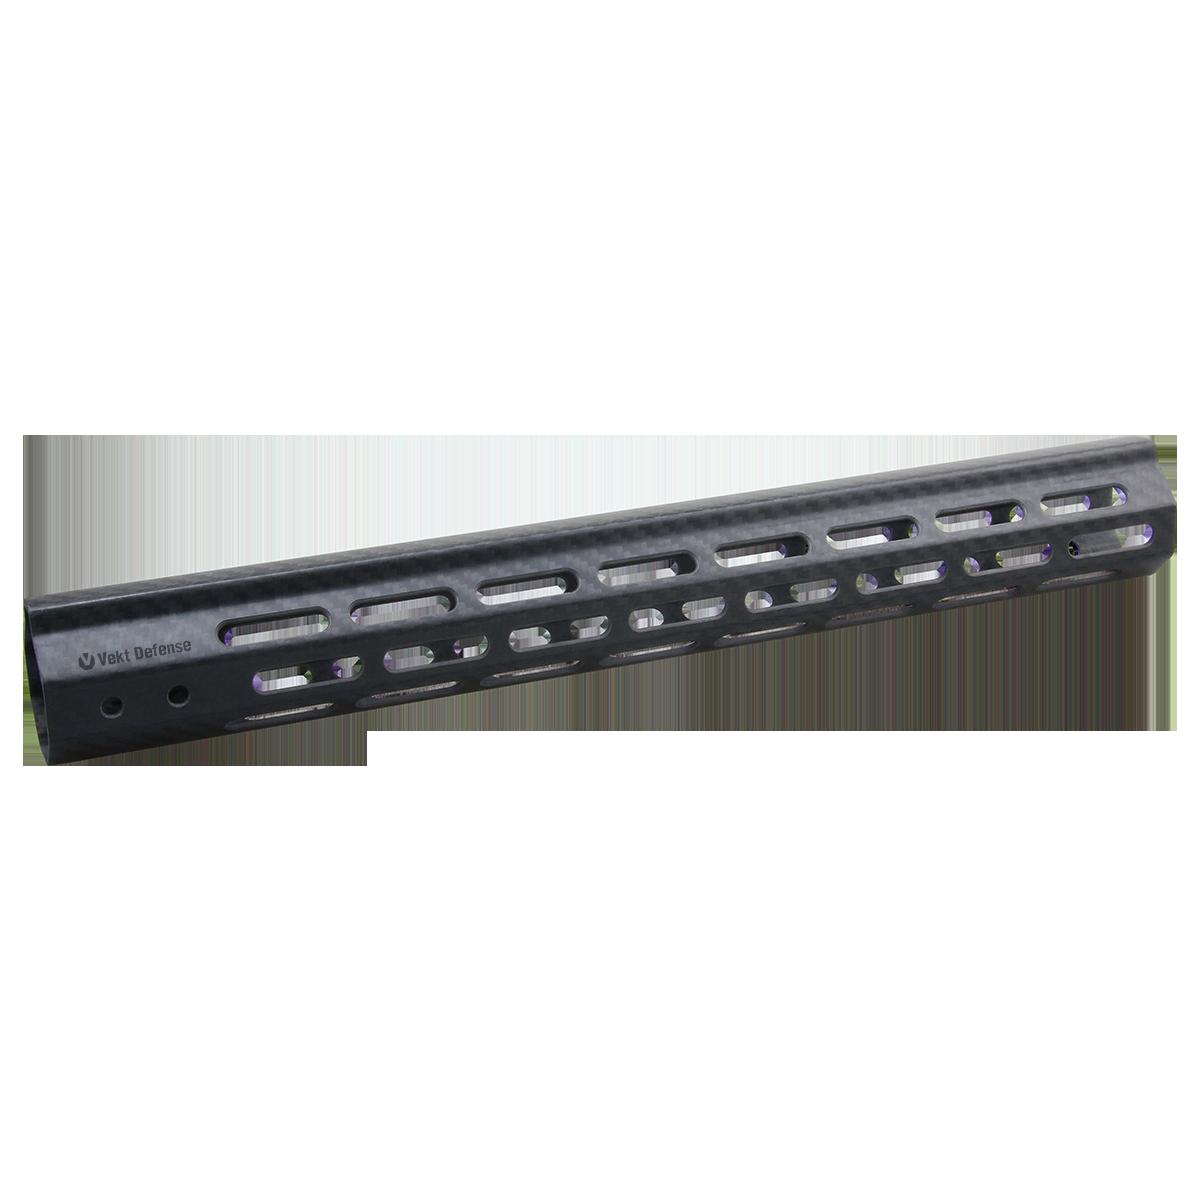 "Vector Optics Vekt Defense VDCF-15 Carbon Fiber 15"" Slim Handguard Rail Mount"